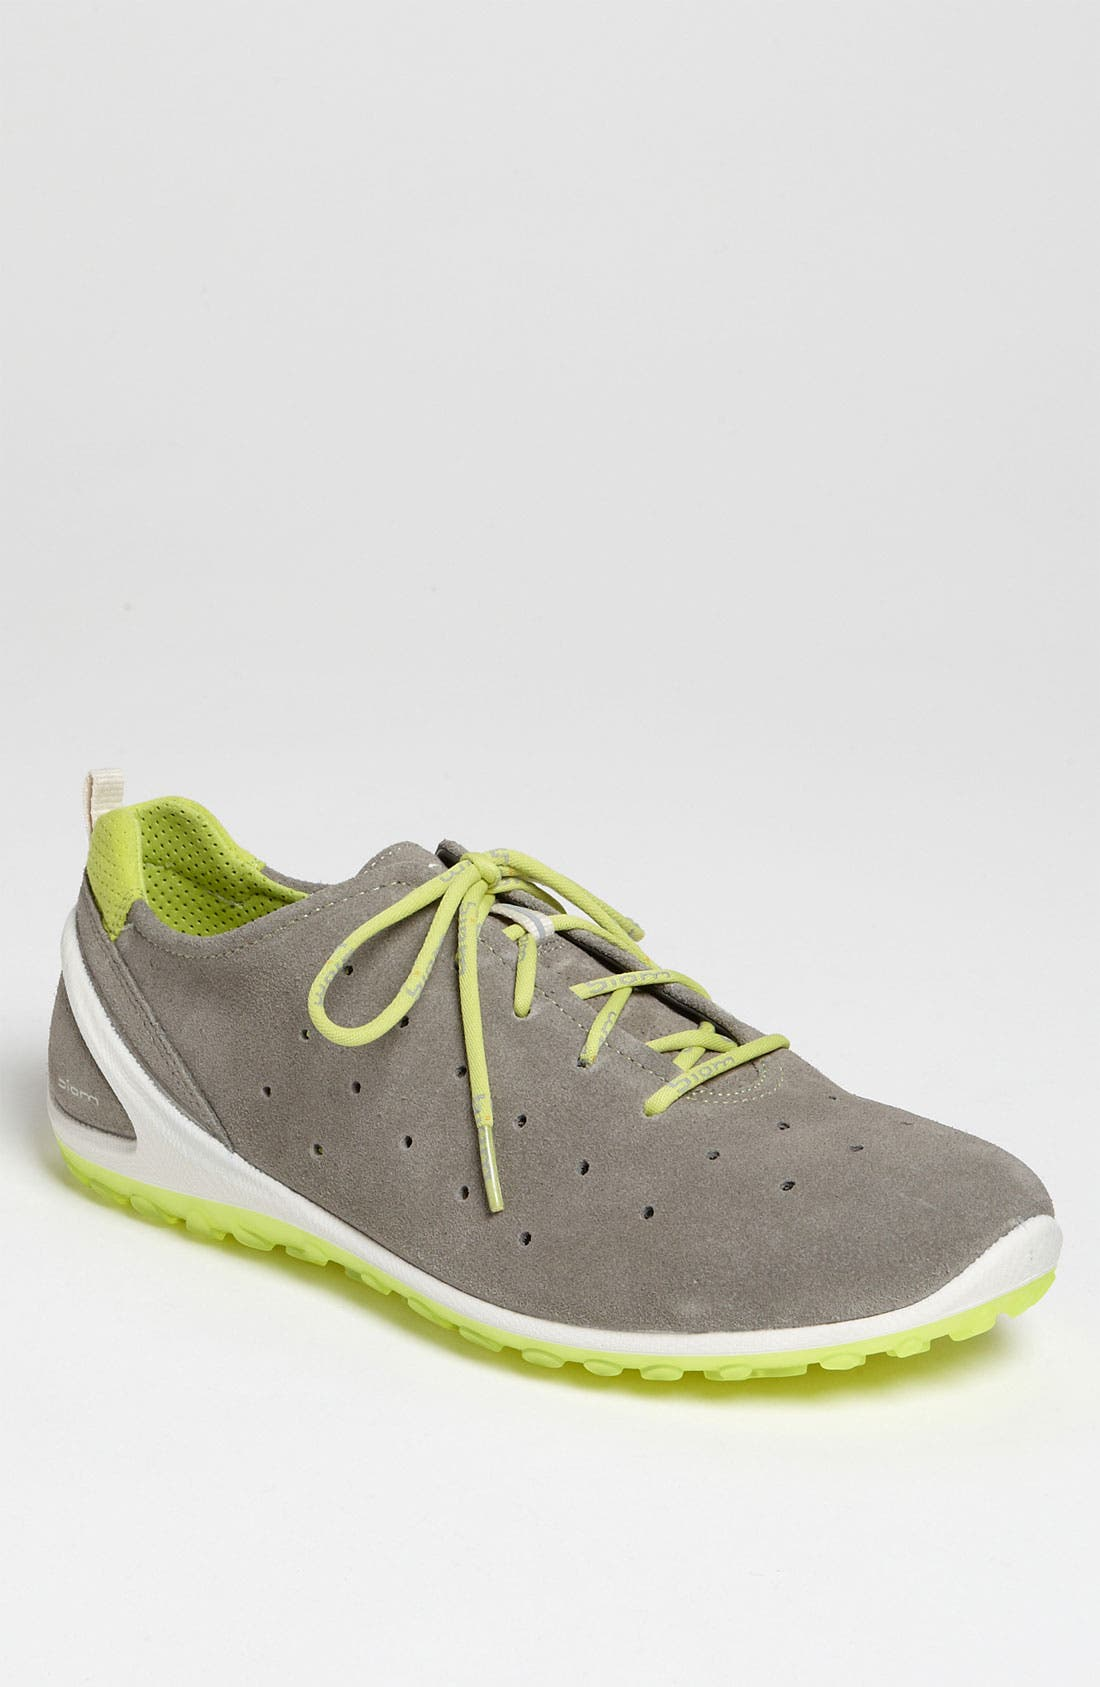 Alternate Image 1 Selected - ECCO 'Biom Lite 1.2' Training Shoe (Men)